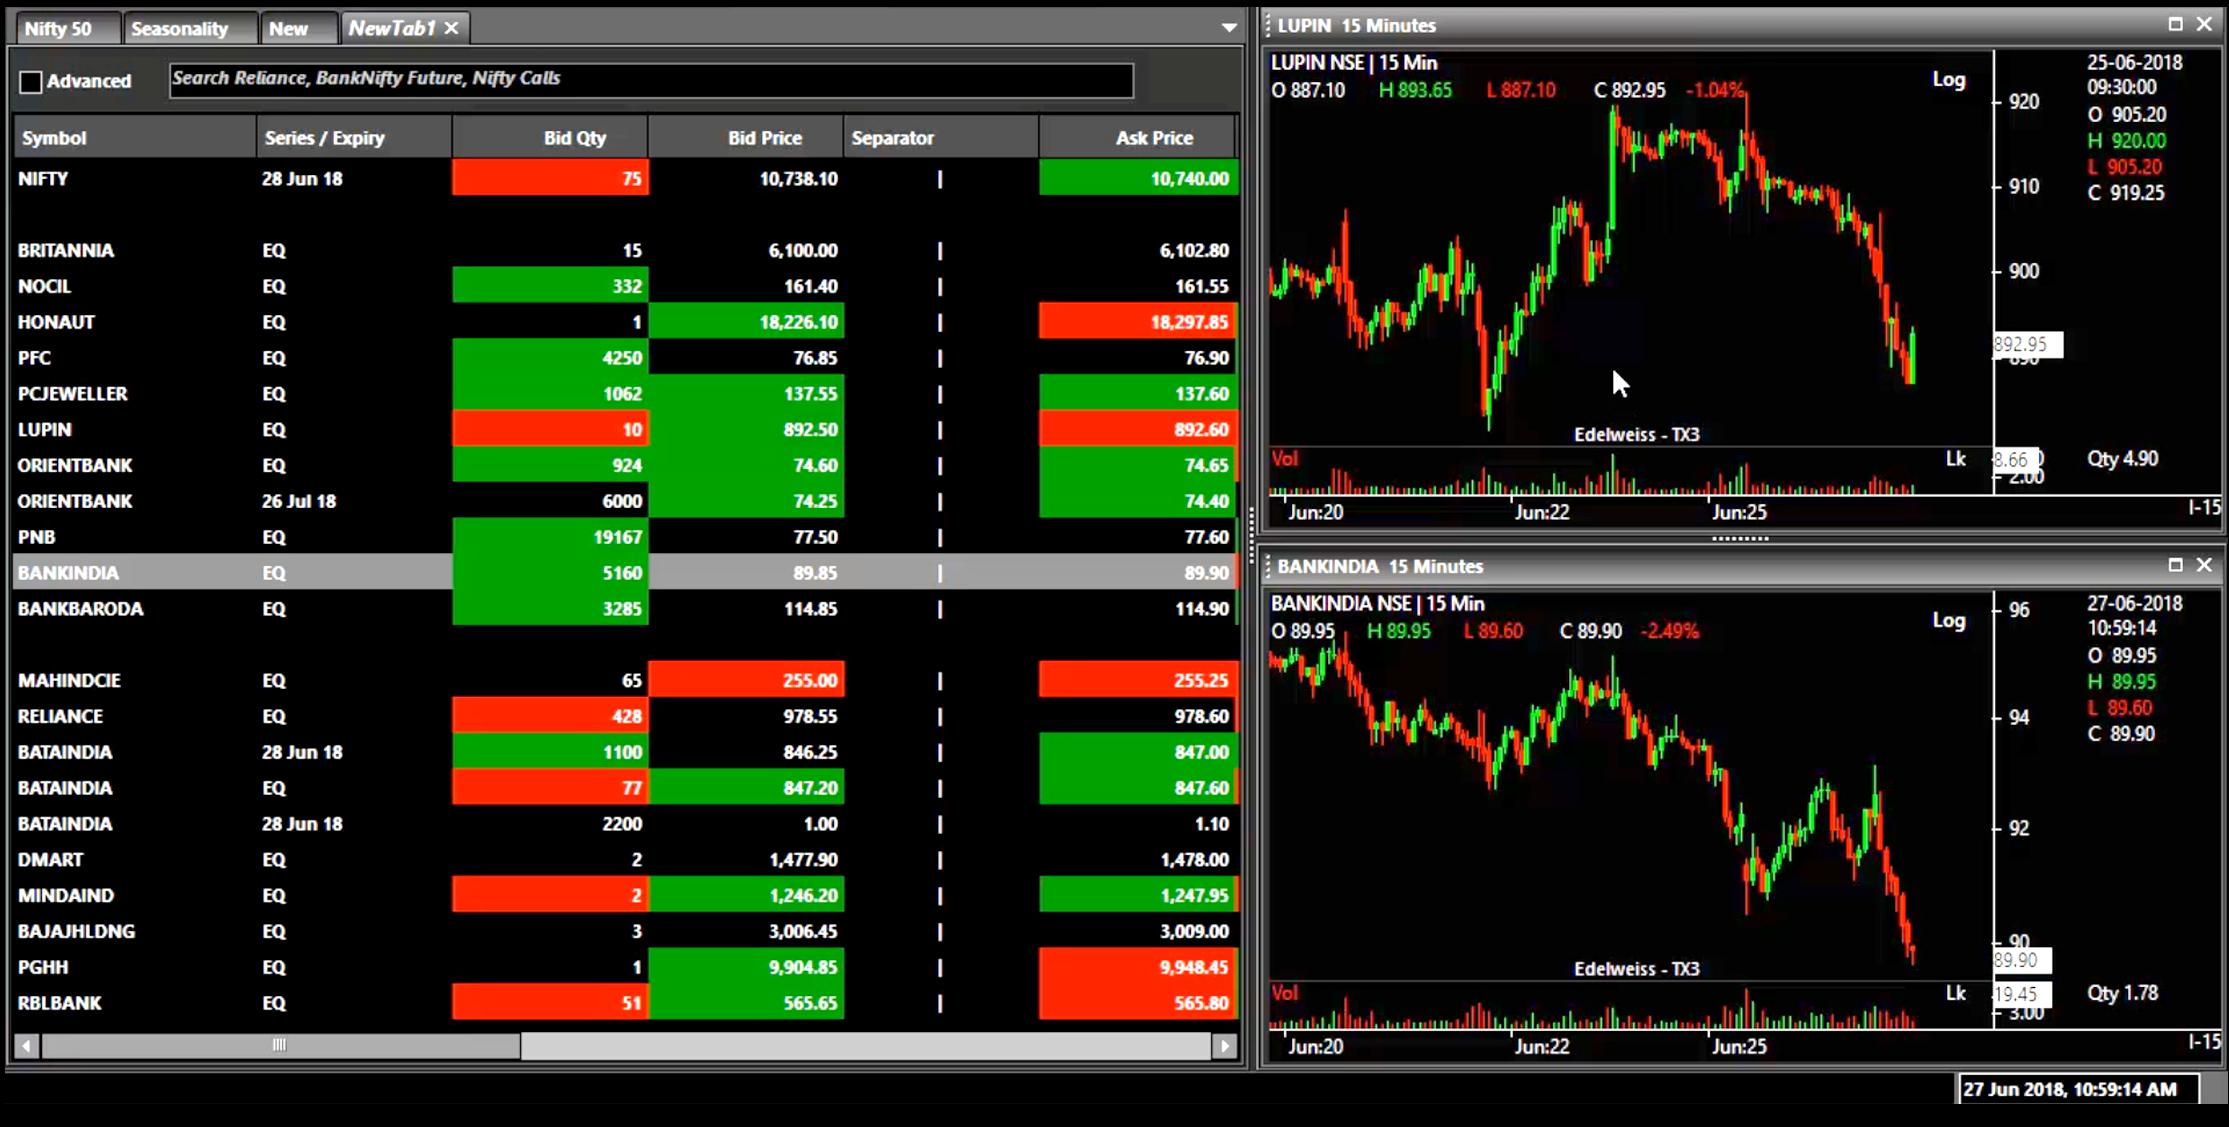 How Software like Metatrader 4 Has Revolutionized The Financial Trading World